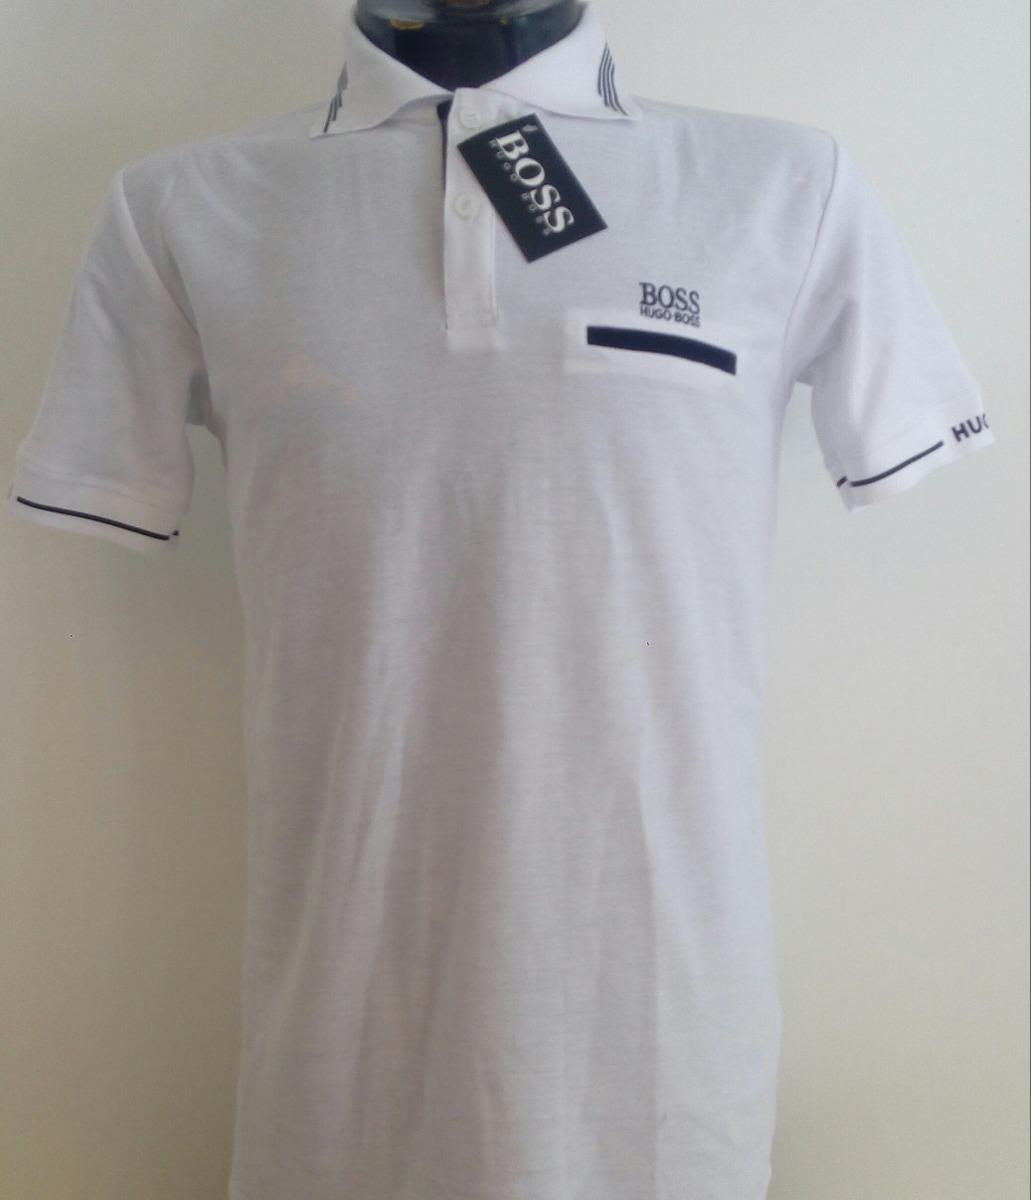 camisa playera tipo polo hugo boss color blanco negro casual. Cargando zoom. 2745813150232